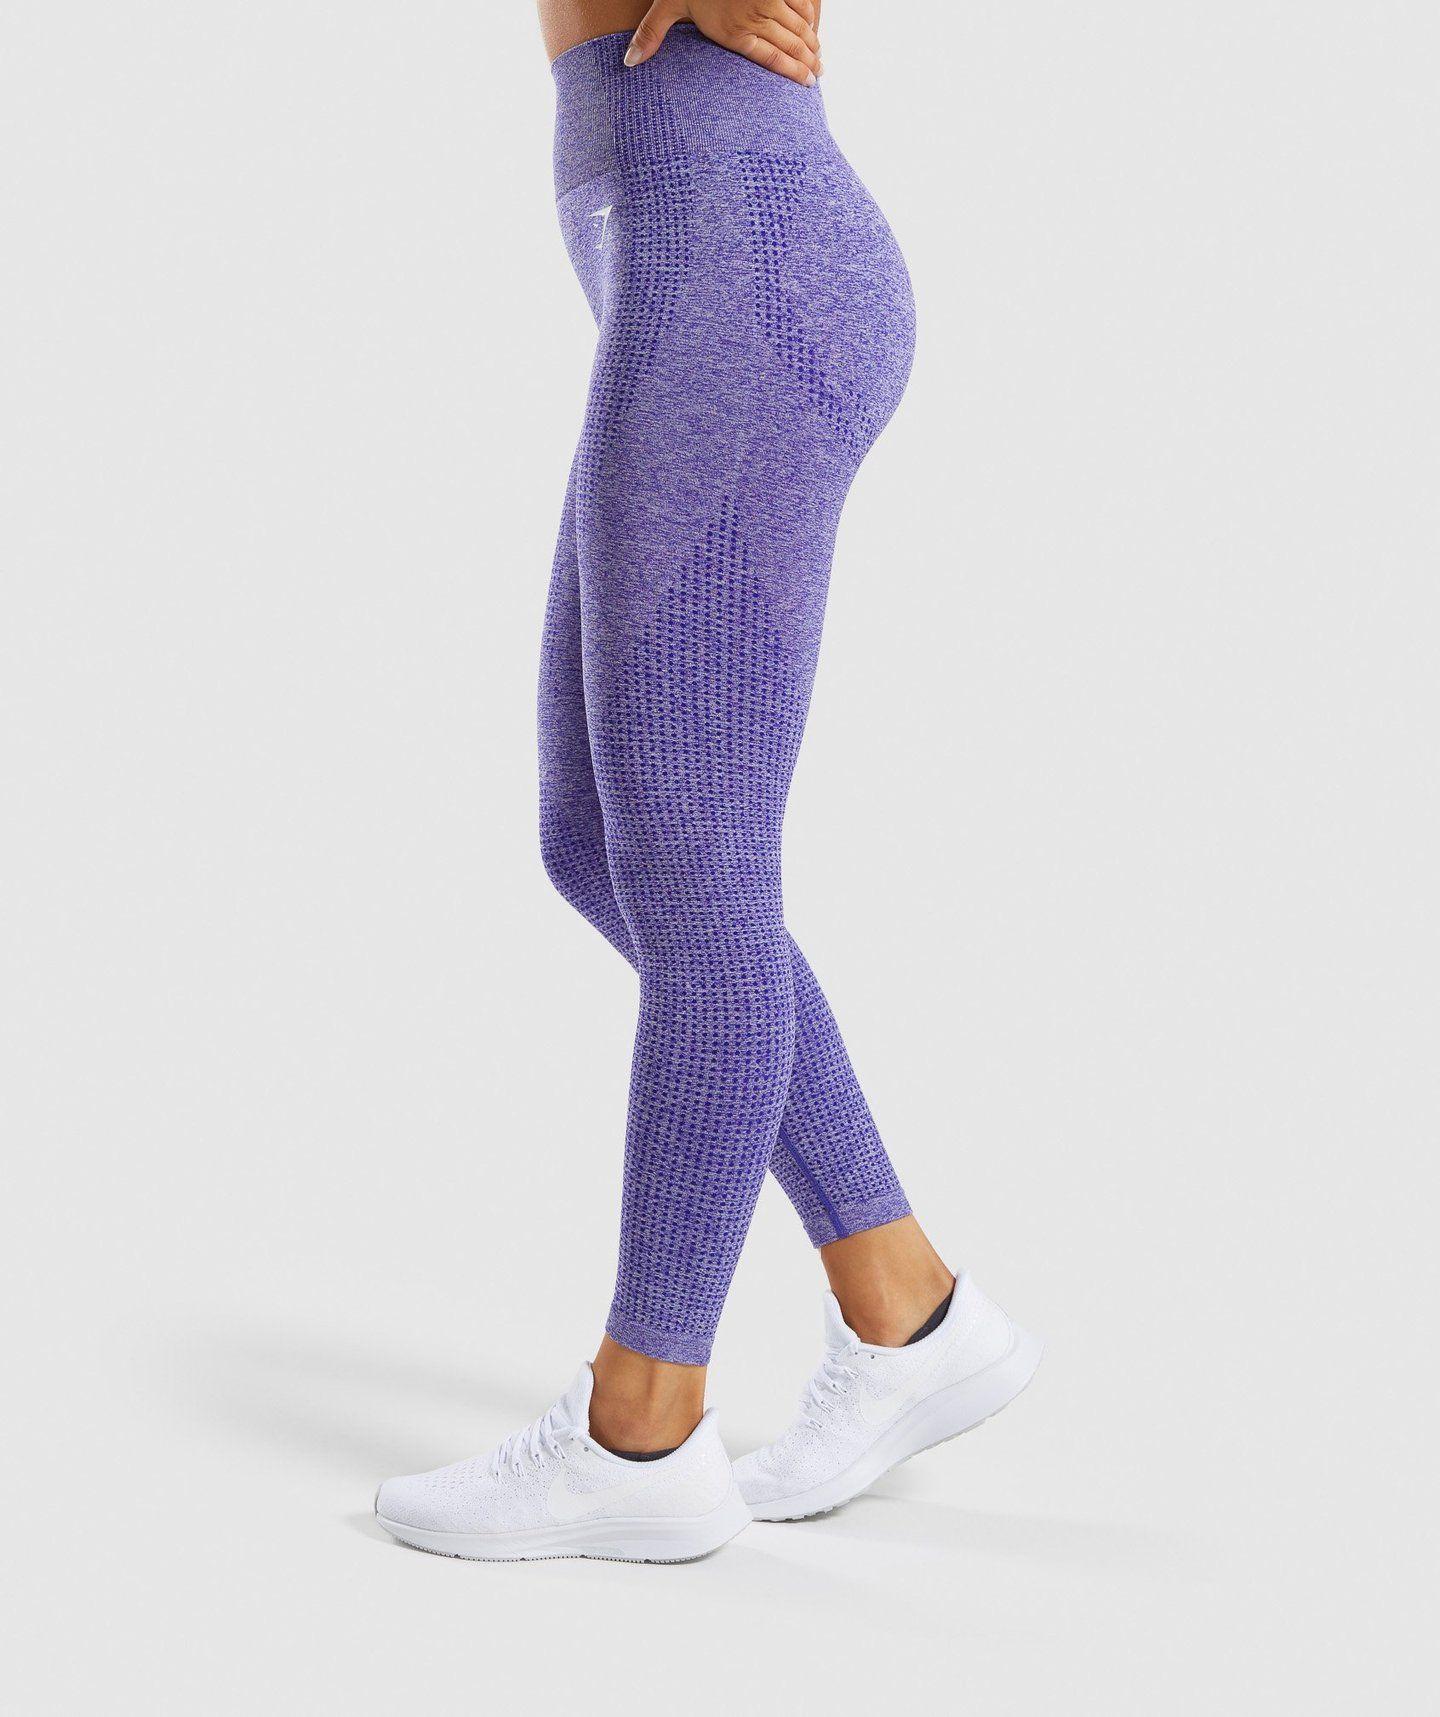 bb71d14f98d9a2 Gymshark Vital Seamless Leggings - Indigo Marl in 2019 | Wish List ...